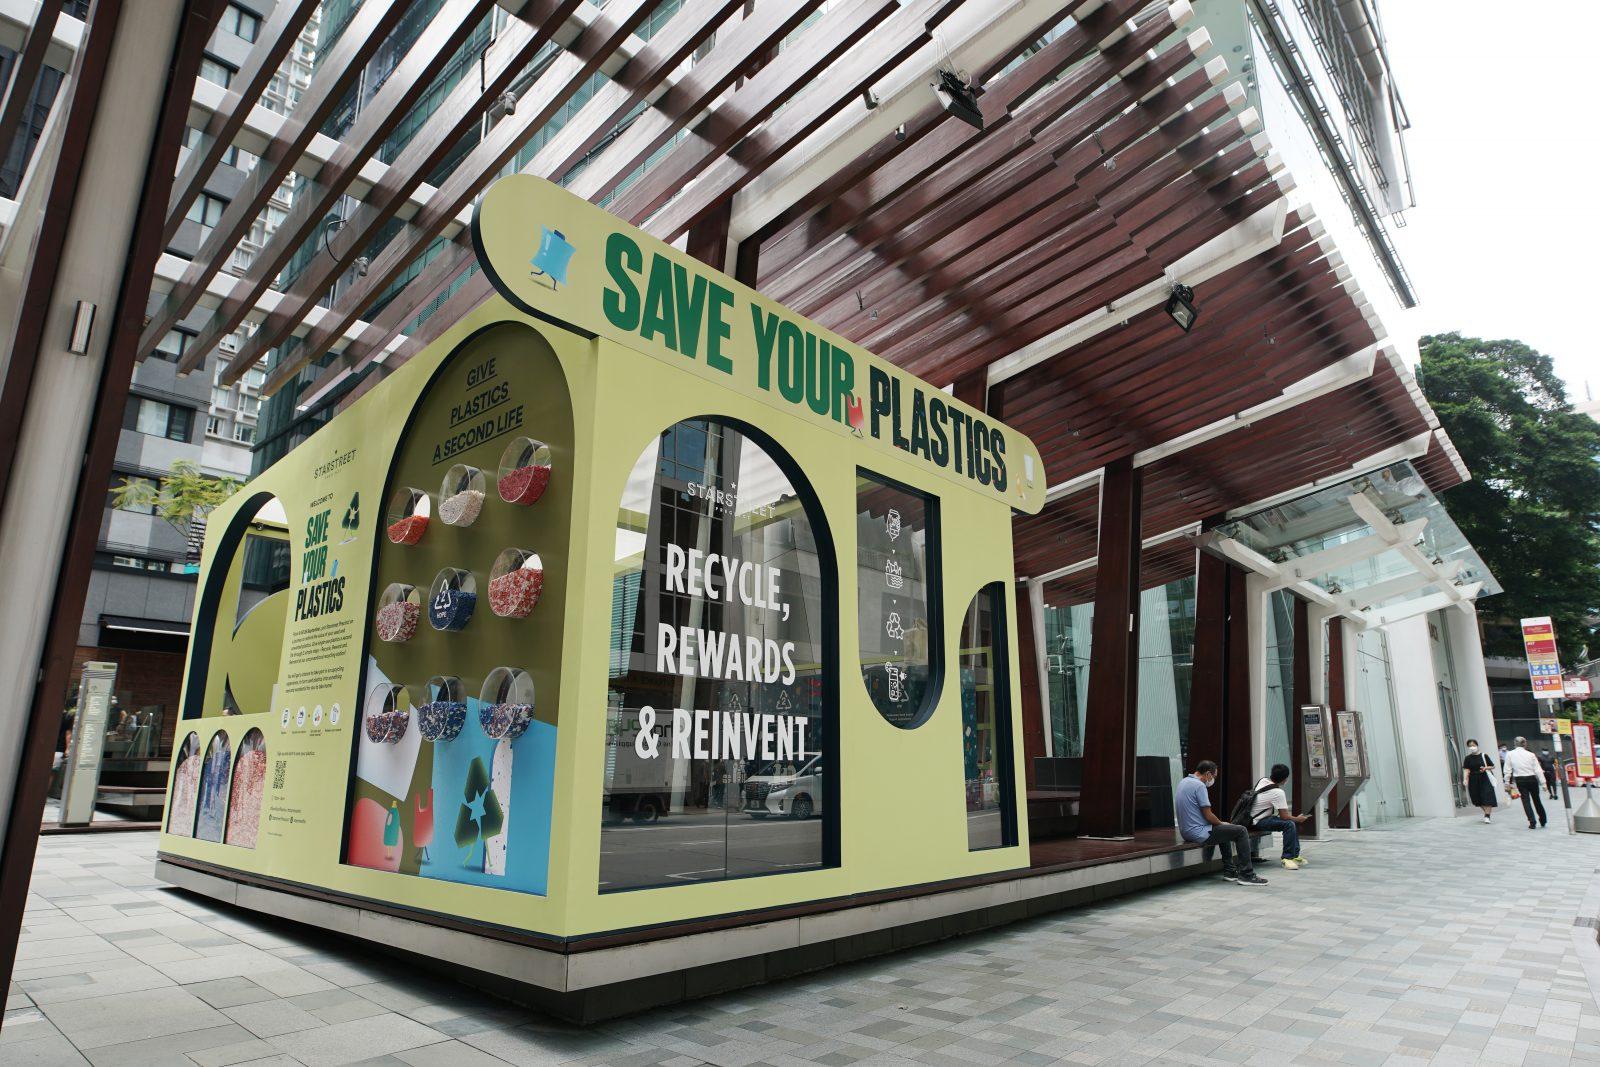 save your plastics recycling programme at starstreet precinct